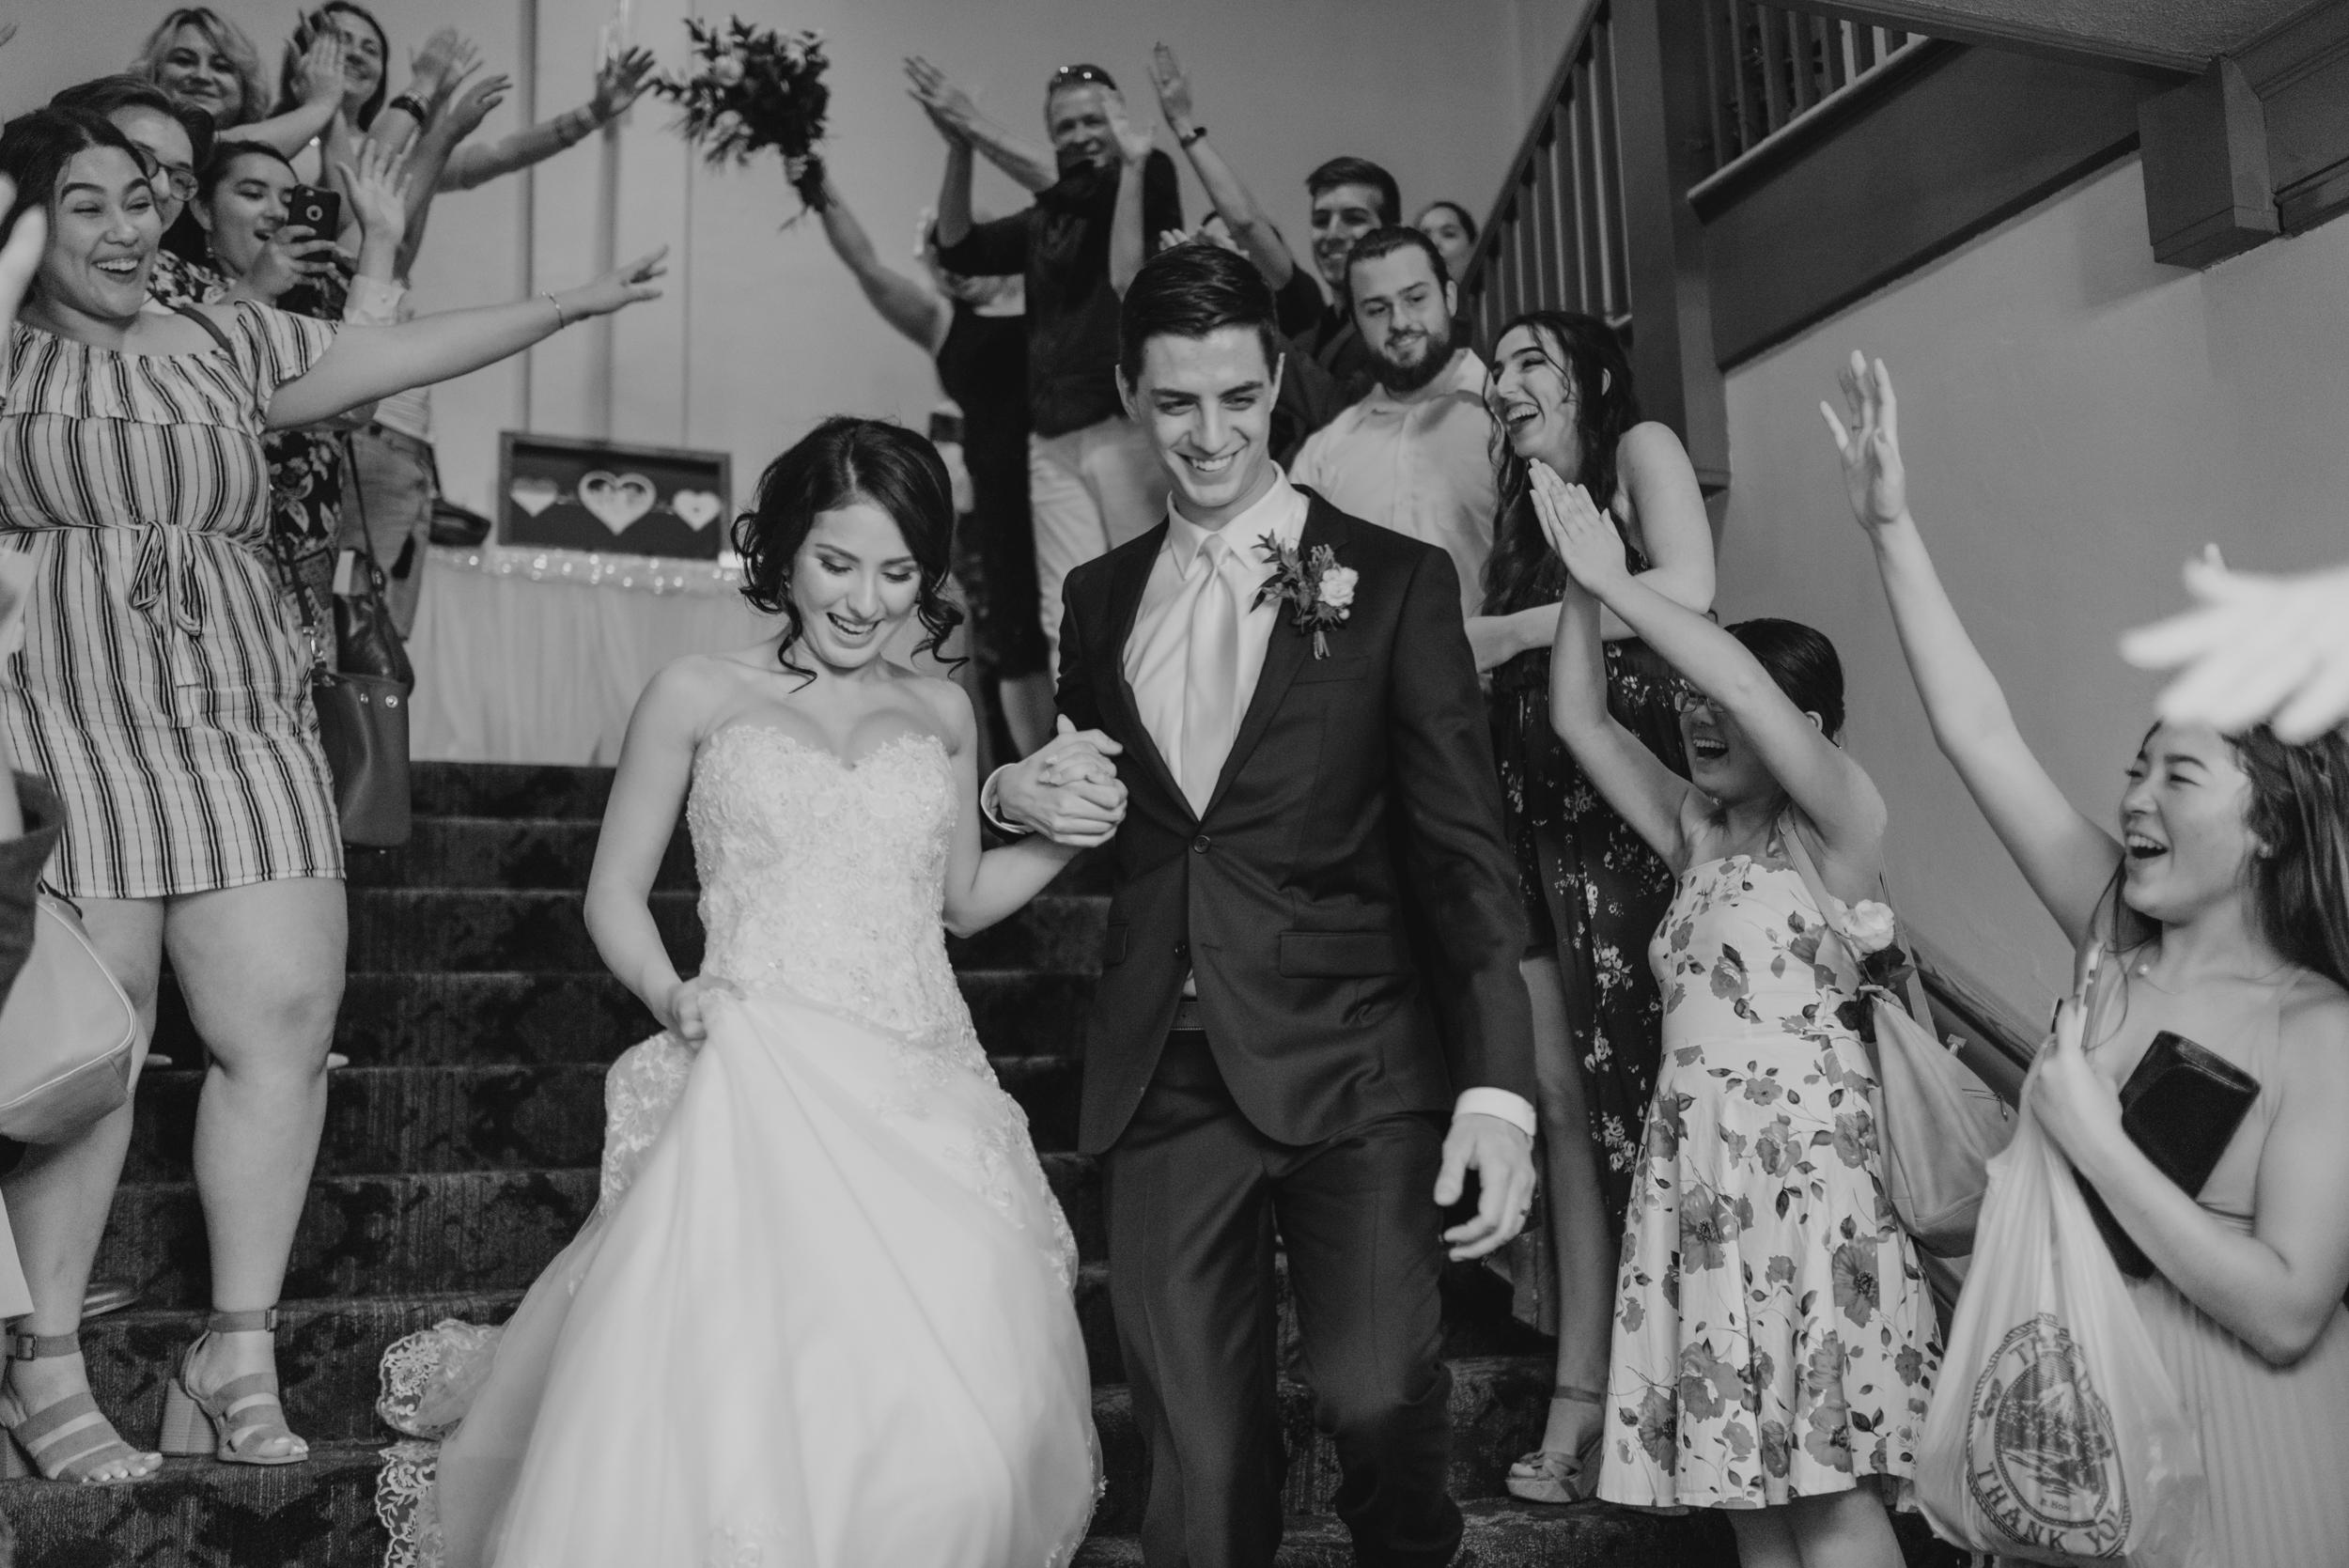 143-reception-west-end-ballroom-portland-wedding-photographer-8984.jpg